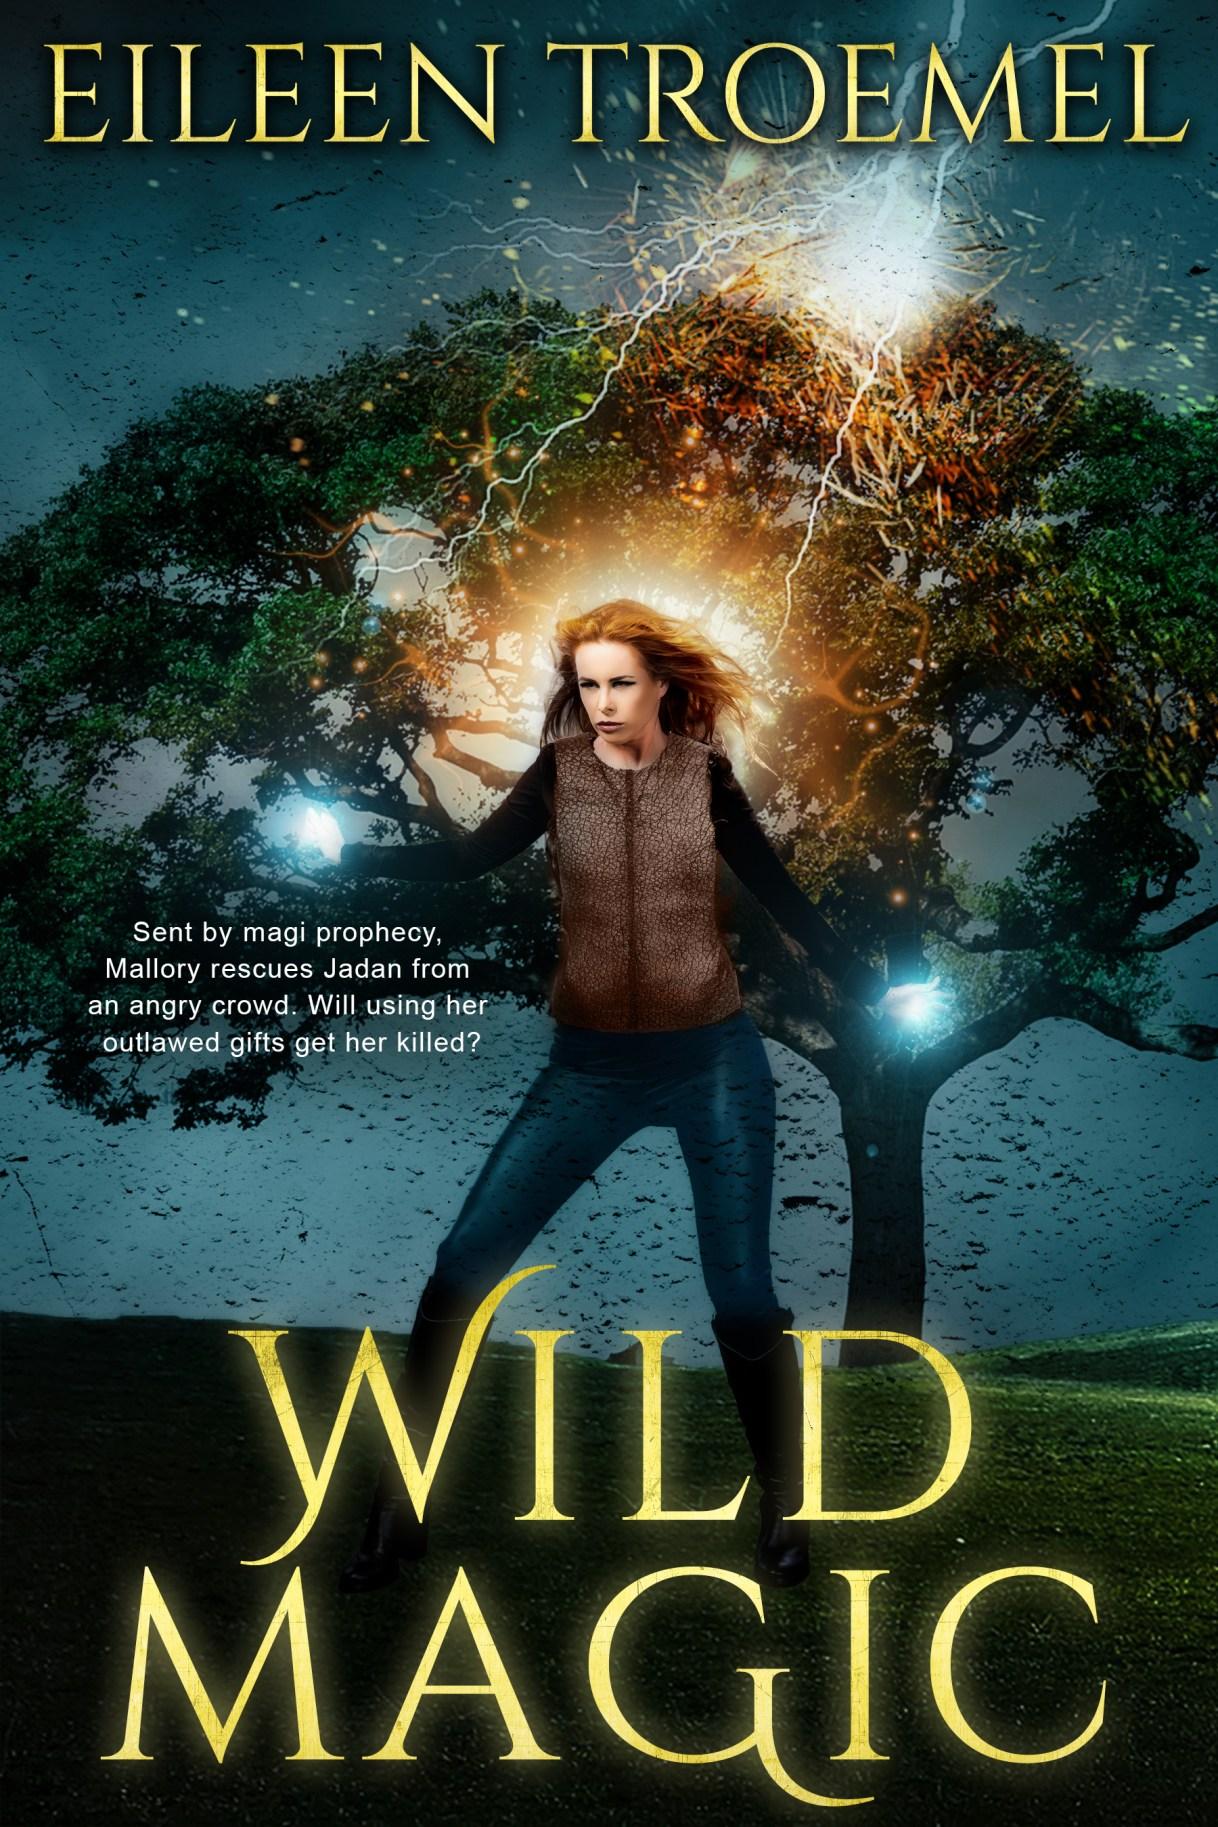 Wild Magic_ by Eileen Troemel #EileenTroemel #fantasy #adventure #magic #WOYDW #WhatsOnYourDeskWednesday #Wednesday #author #Spotlight